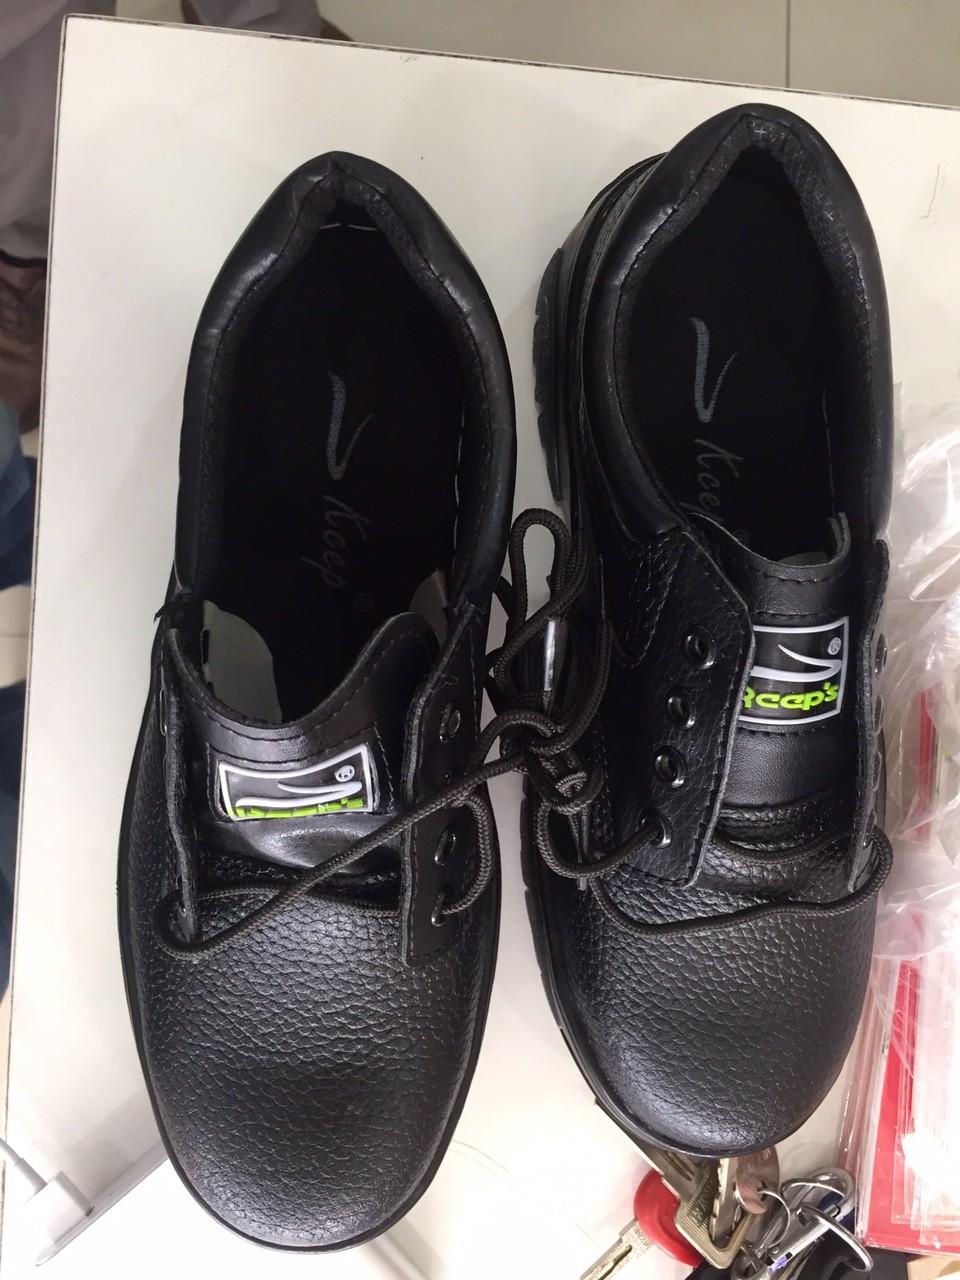 Giày bảo hộ Keep's